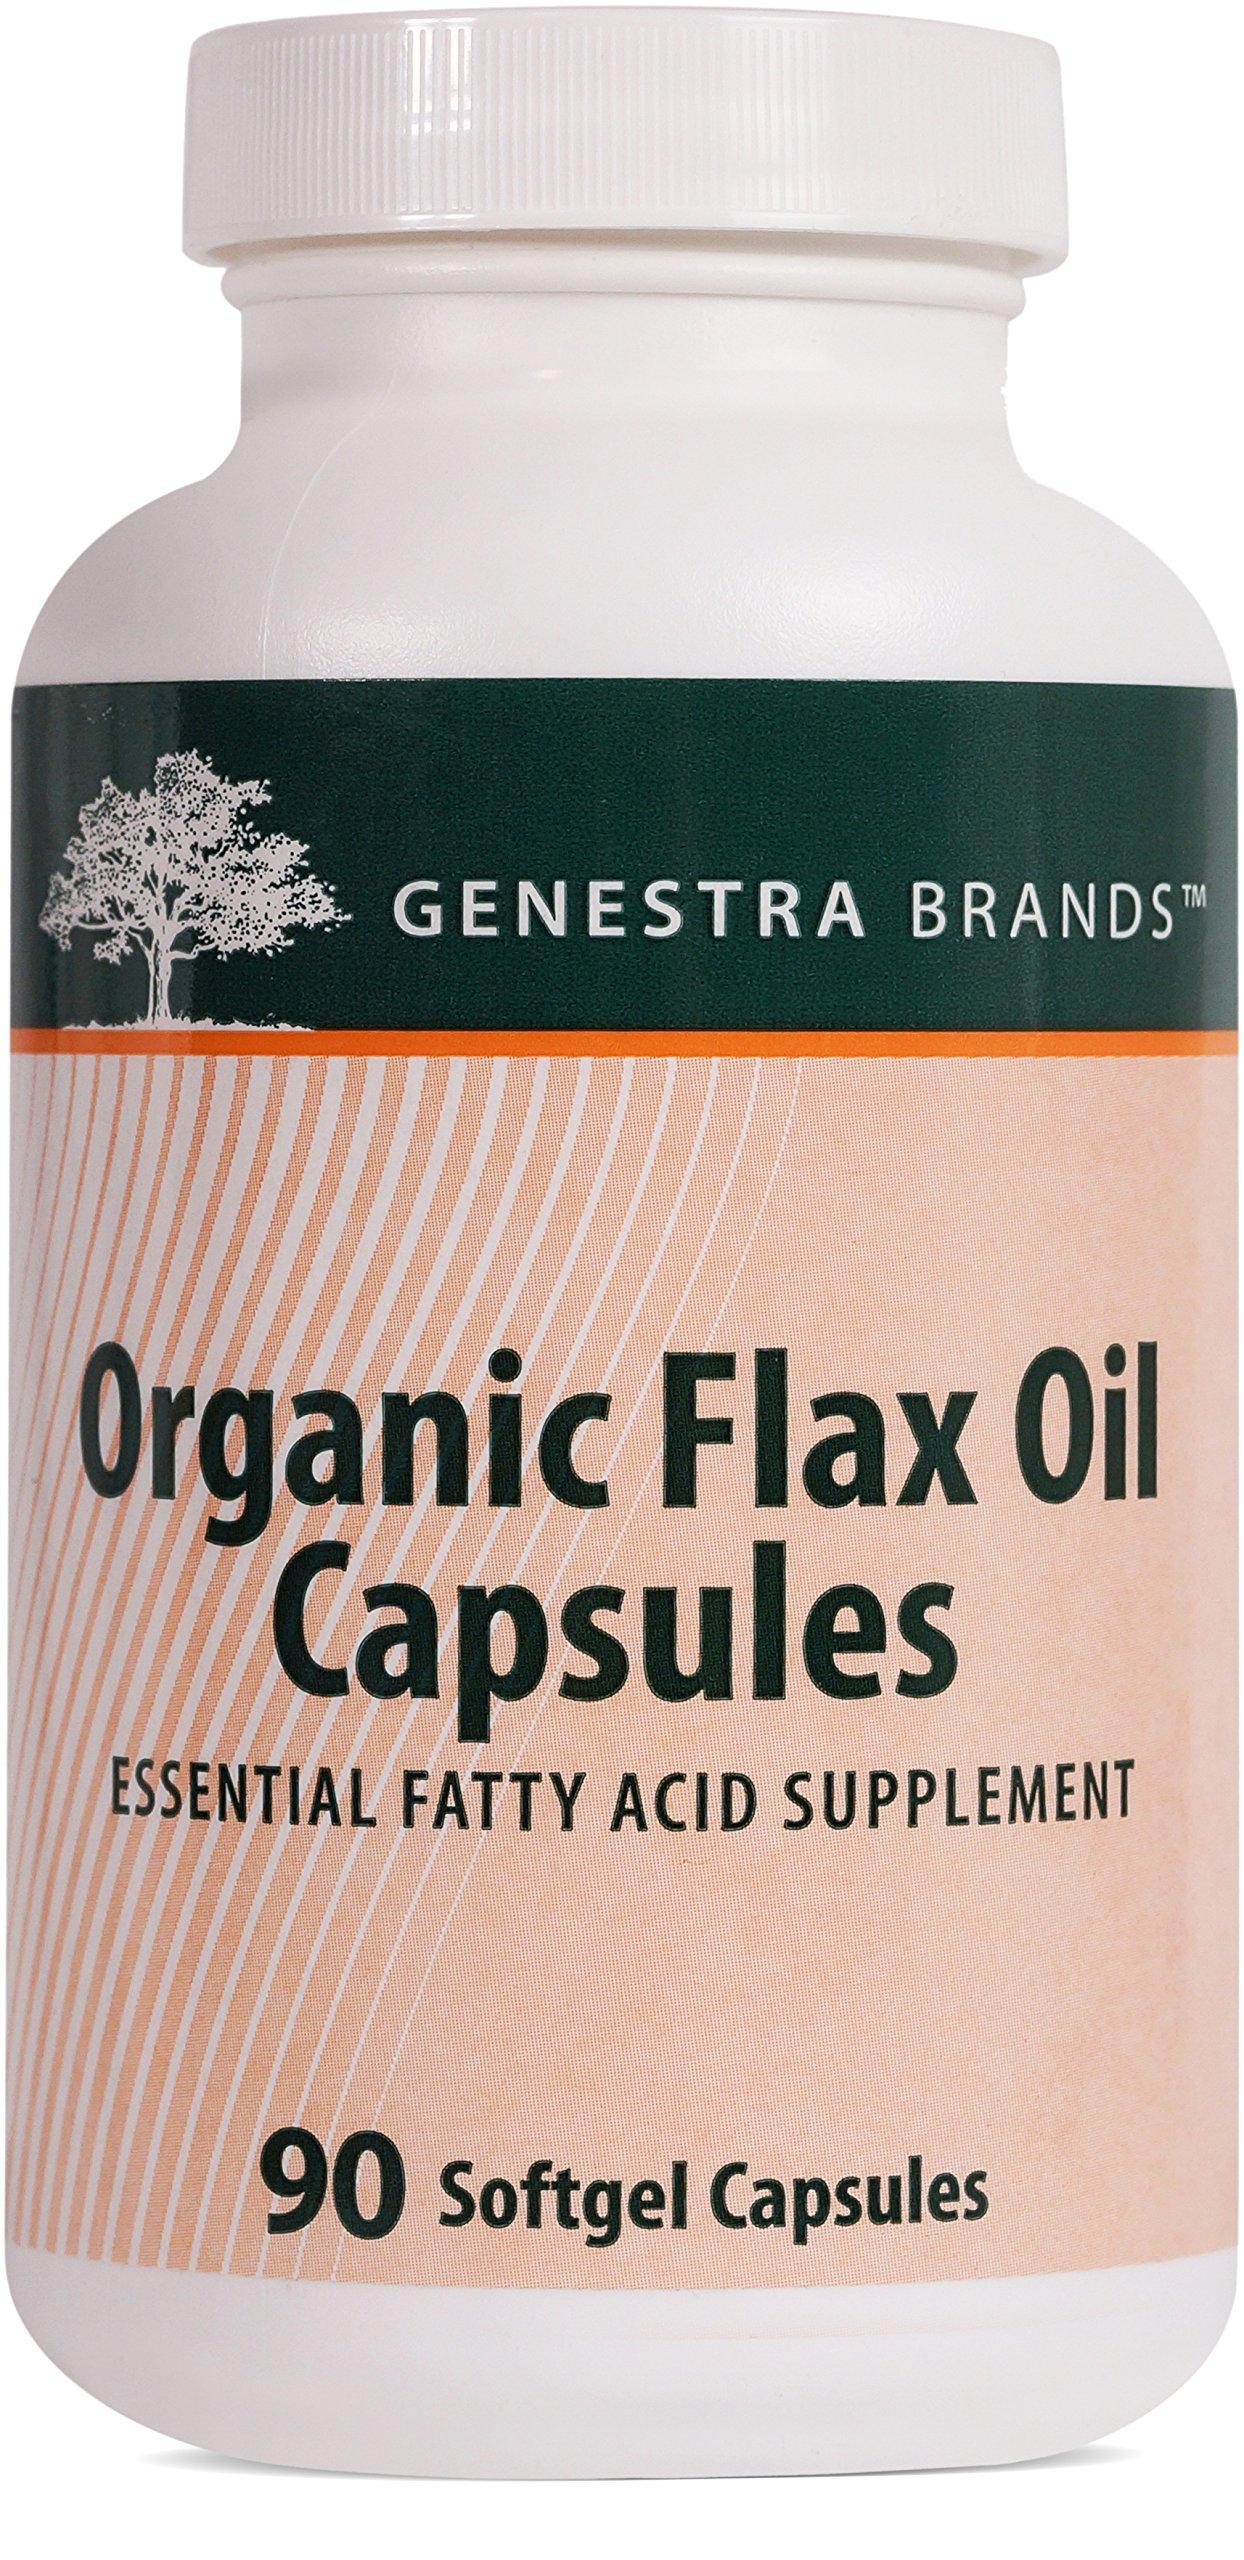 Genestra Brands - Organic Flax Oil Capsules - Essential Fatty Acid Supplement - 90 Softgel Capsules